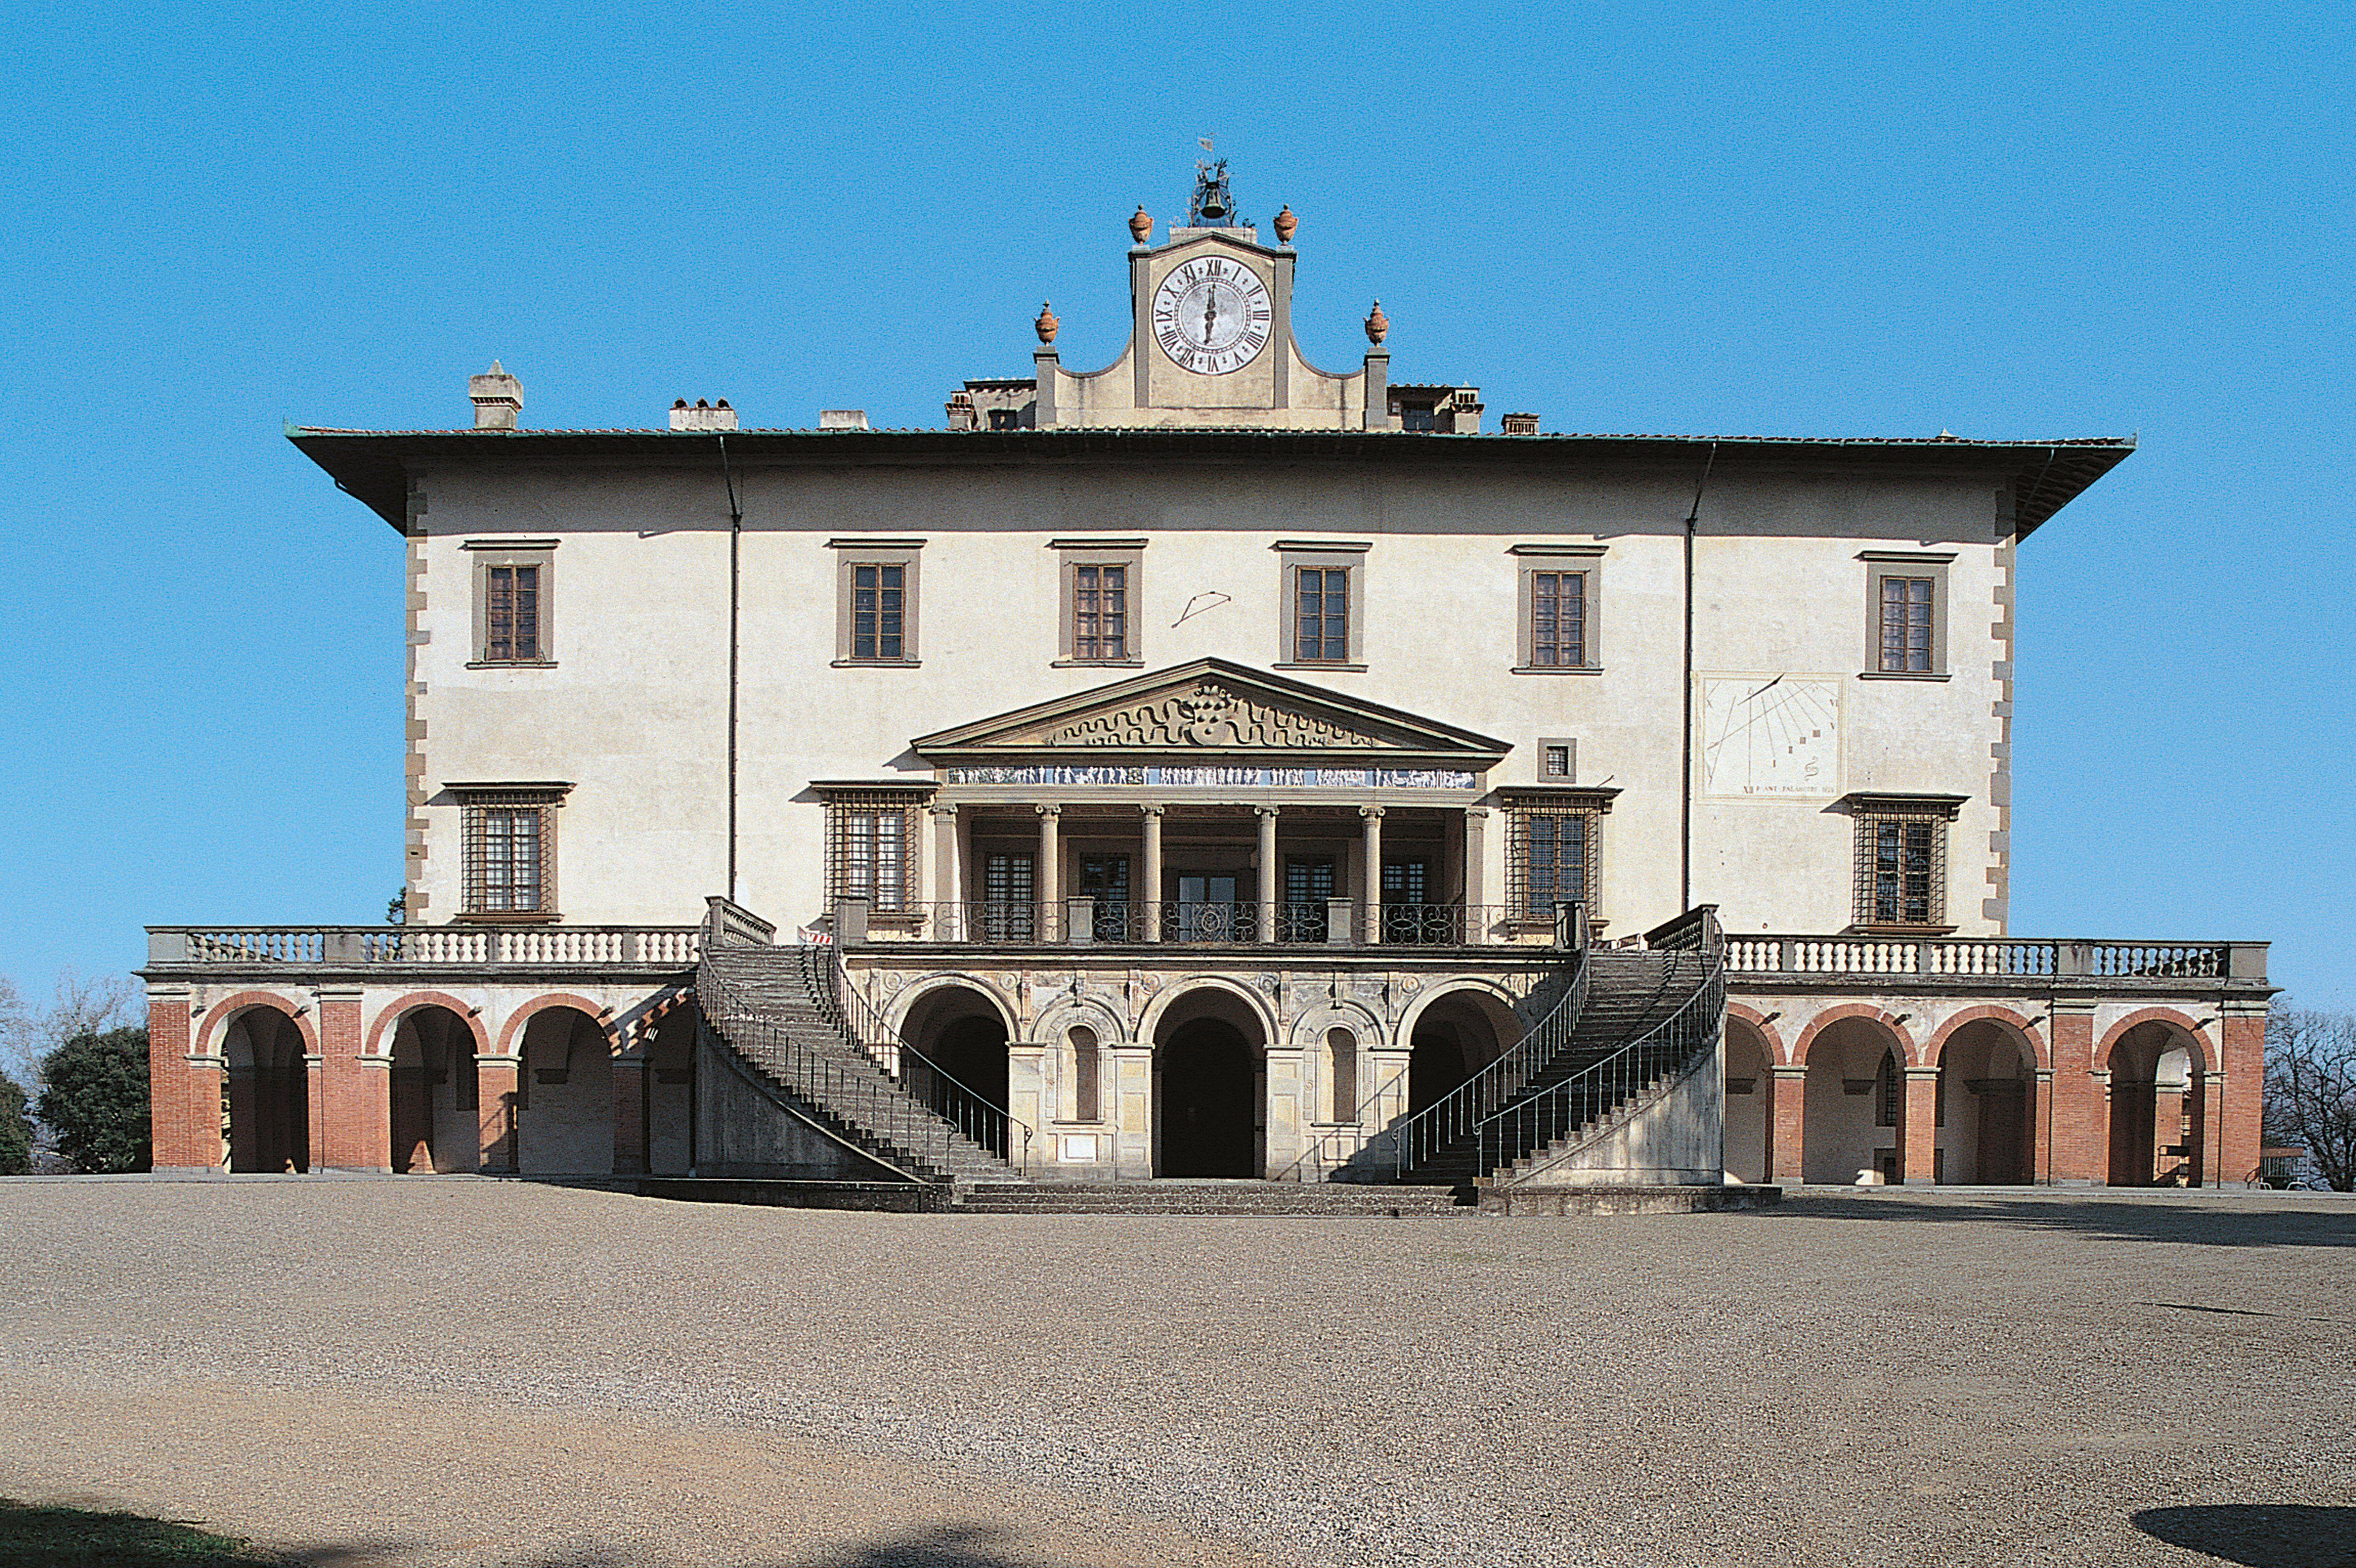 double flight of steps lead into Villa Medici in Poggio a Caiano, Italy